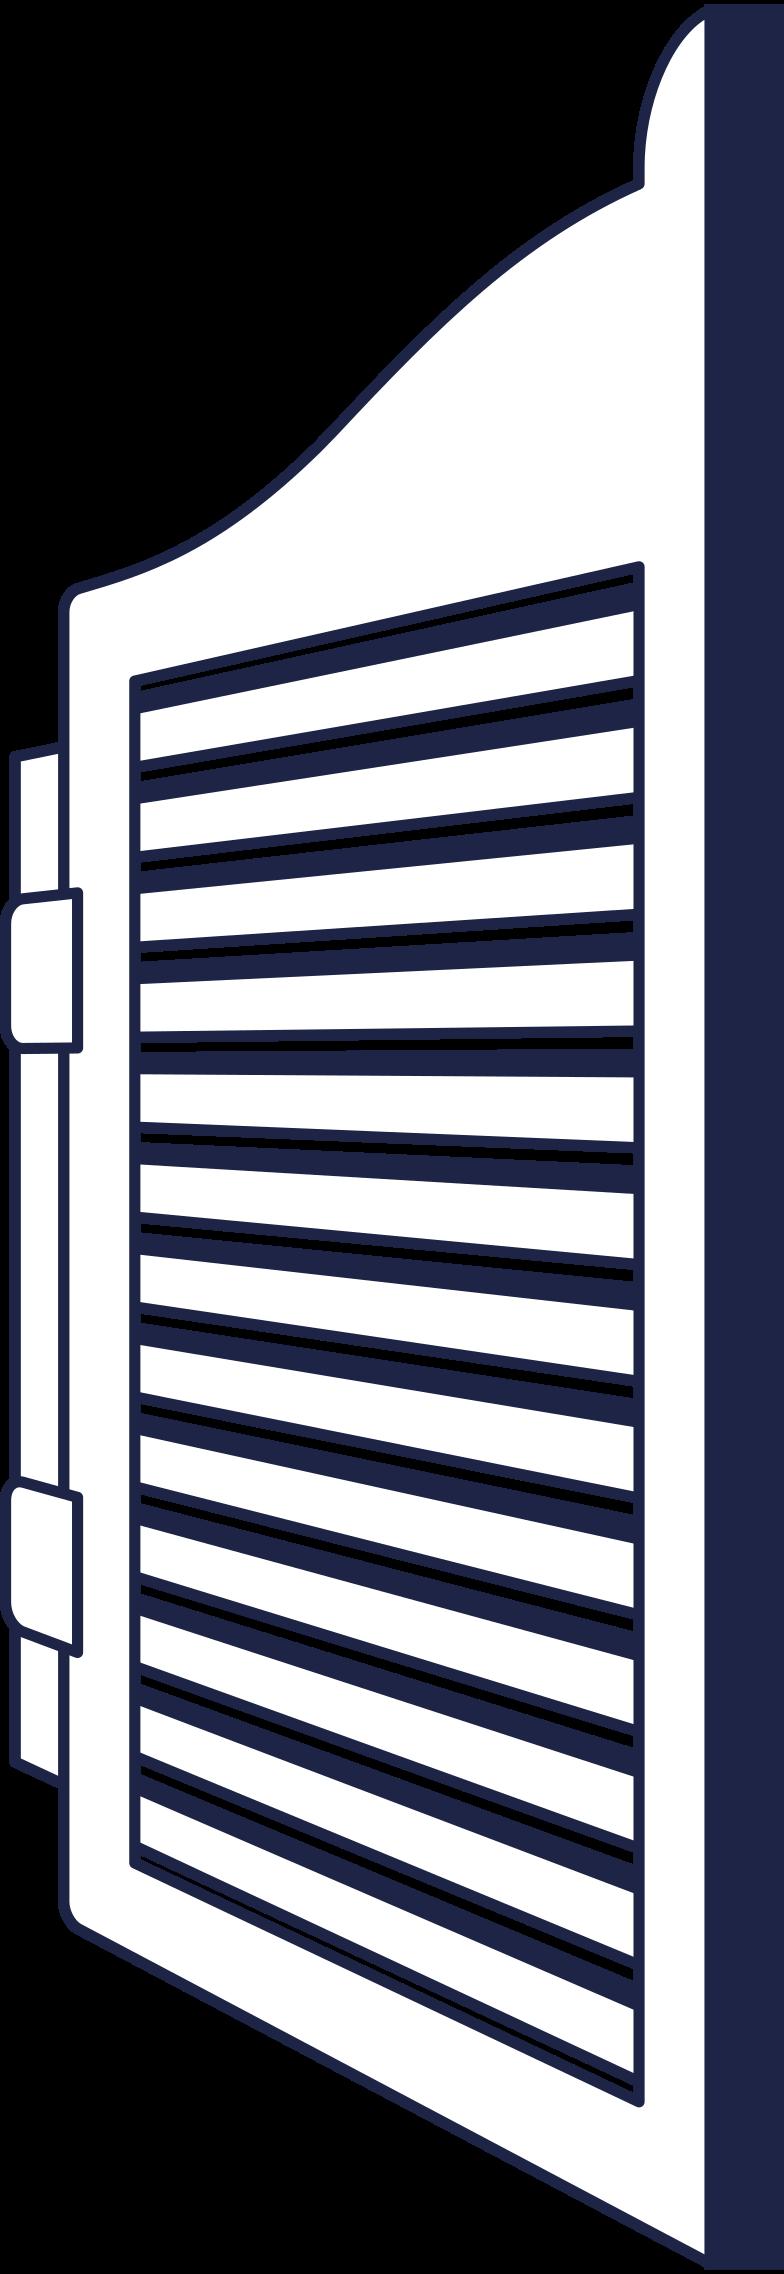 saloon door line Clipart illustration in PNG, SVG